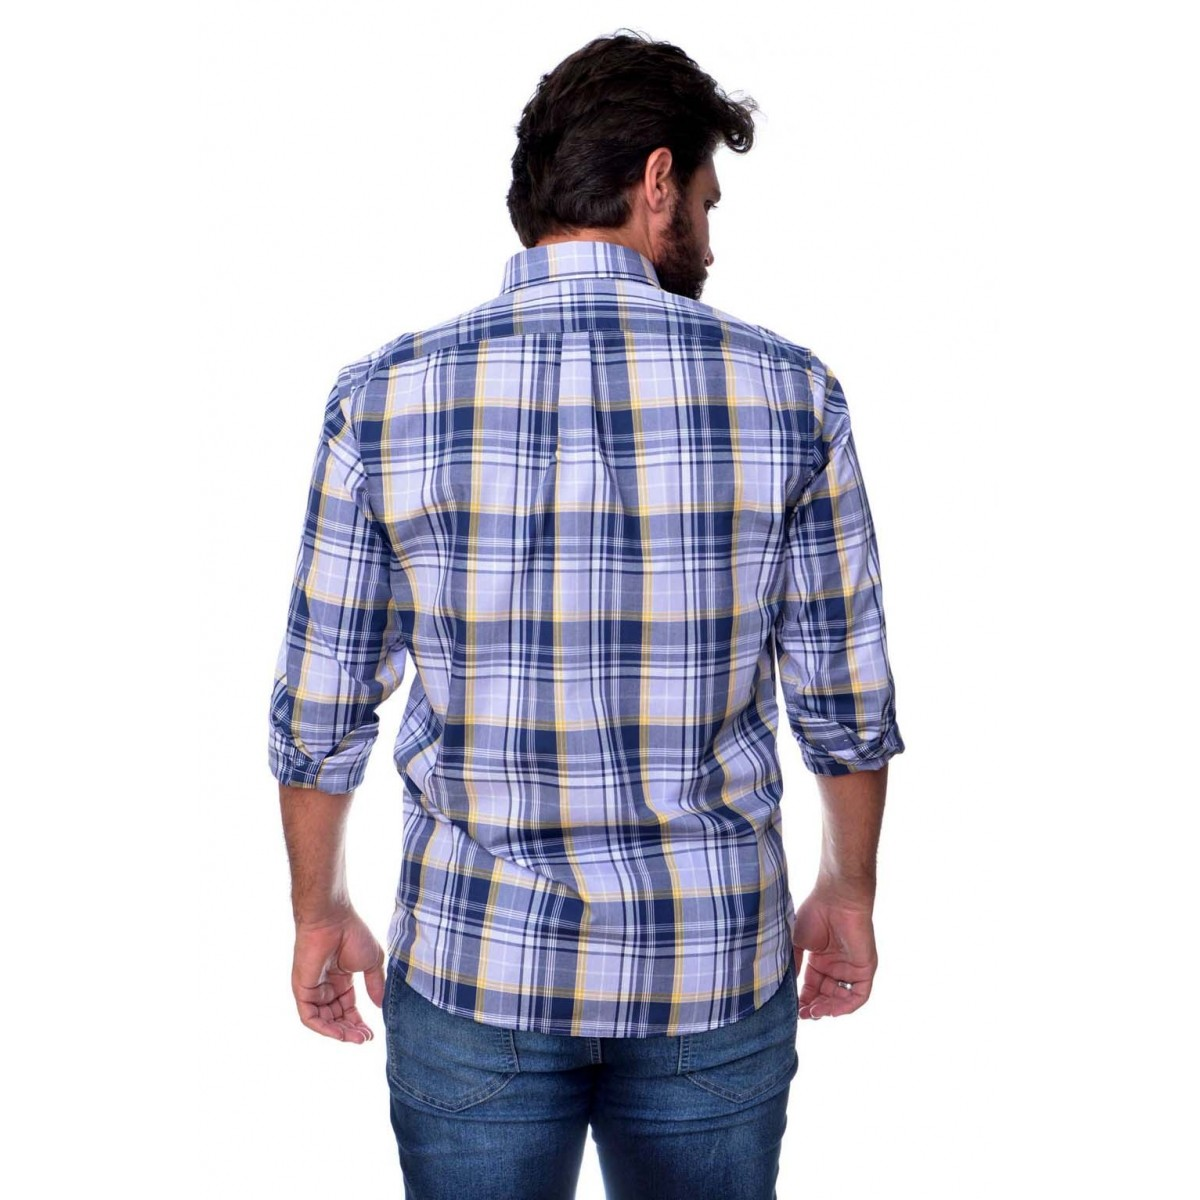 Camisa Social RL Xadrez AZ - Regular Fit  - Ca Brasileira